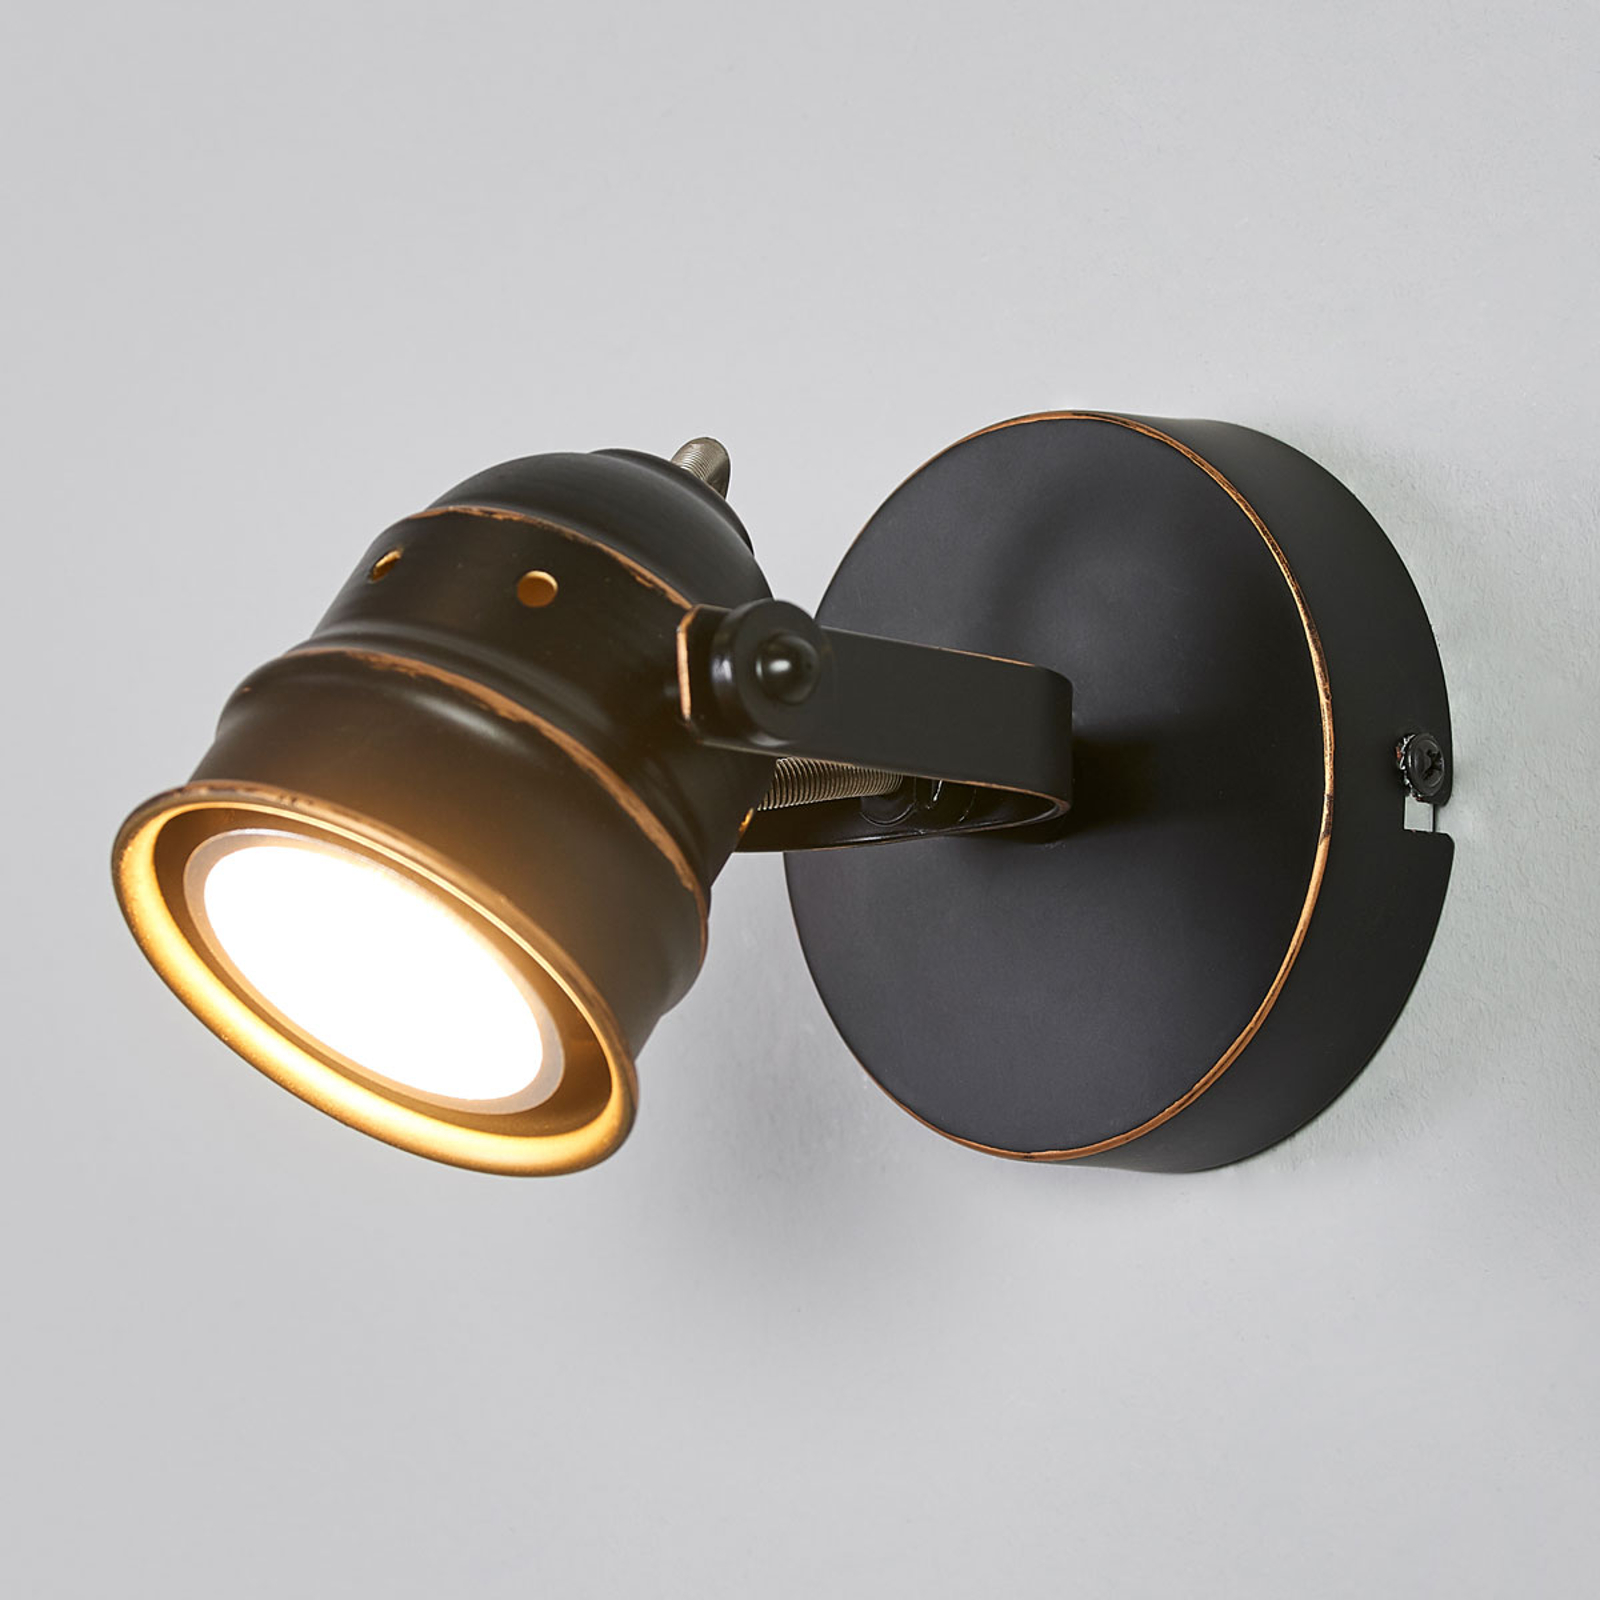 Musta-kultainen GU10-spottivalo Leonor, LED